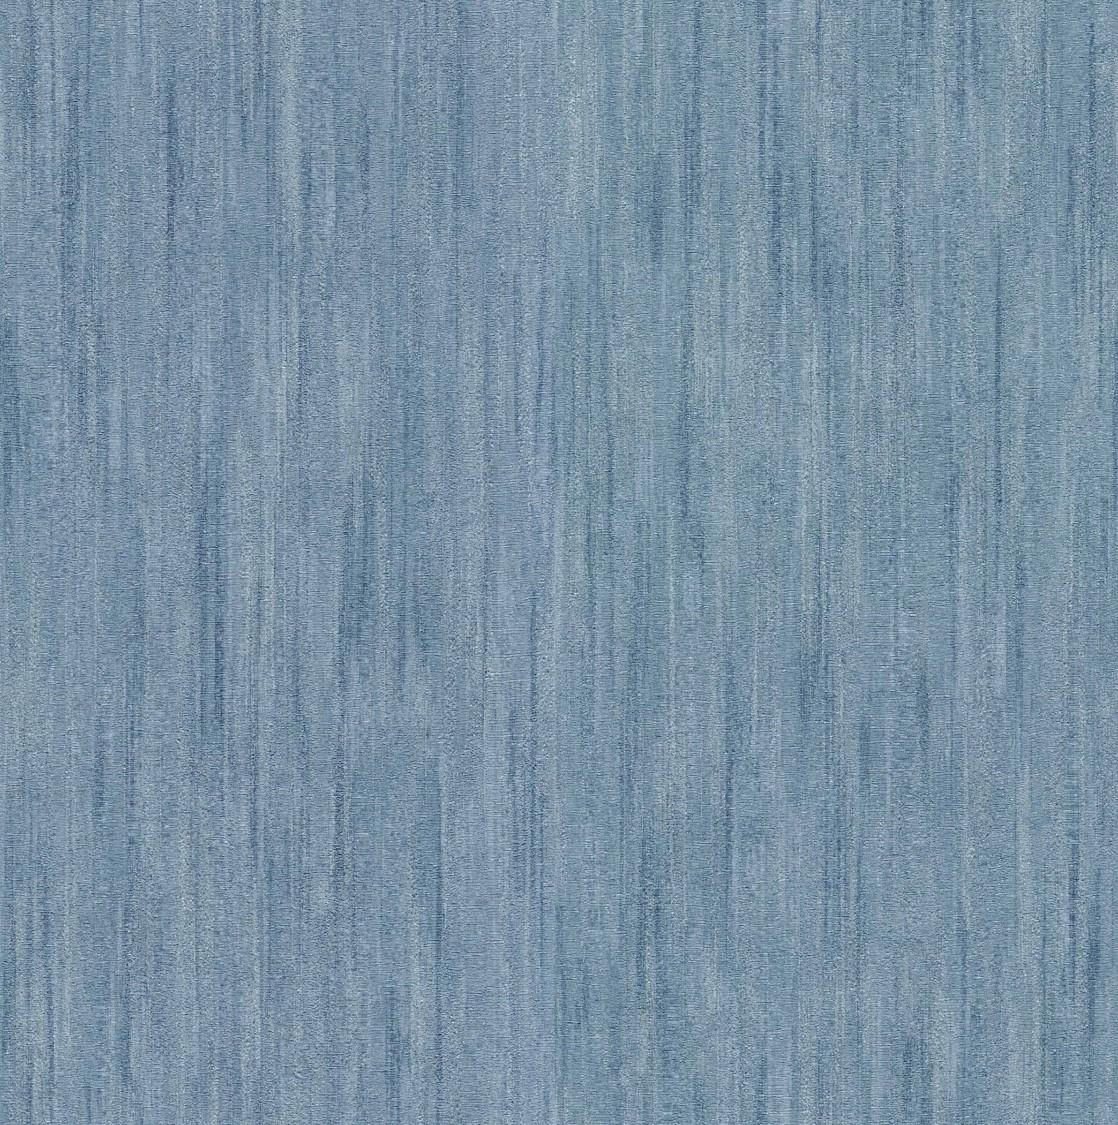 Fine Decor Milano 7 Plain Vinyl Wallpaper-M95590 -Blue